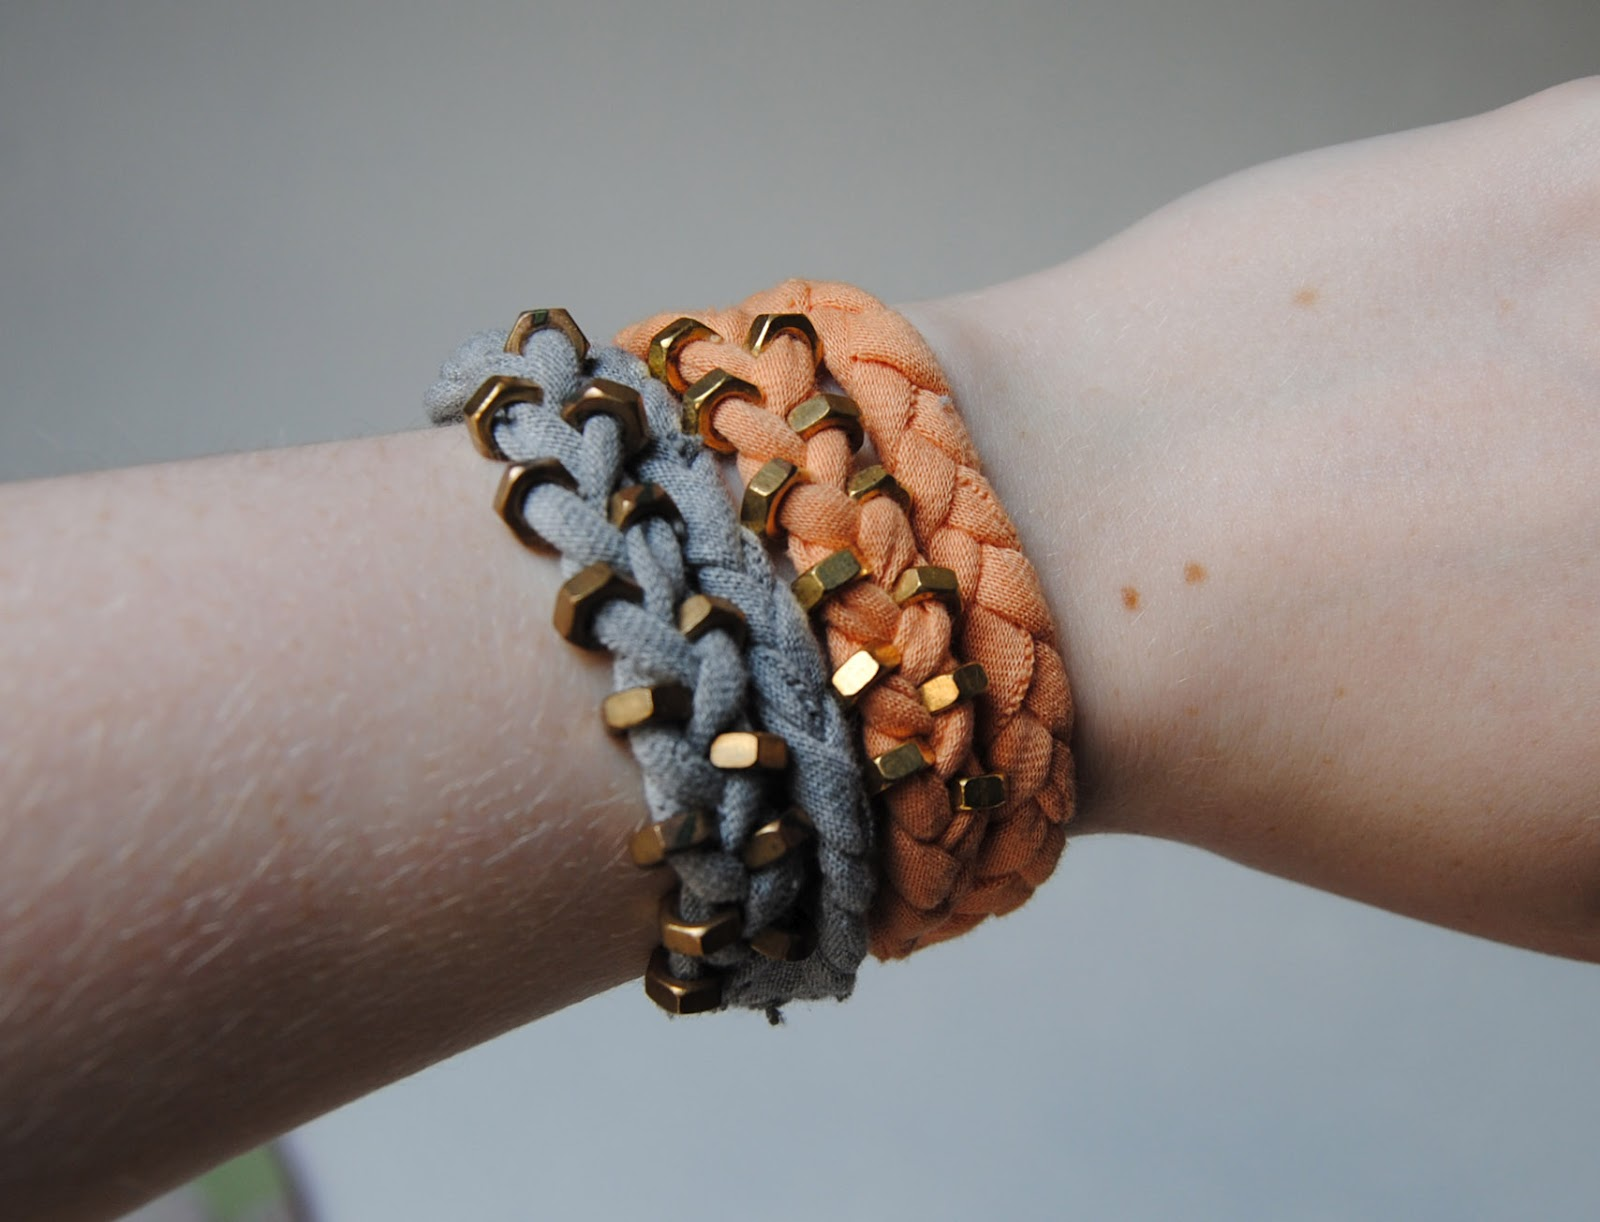 How to do a braided hex nut bracelet